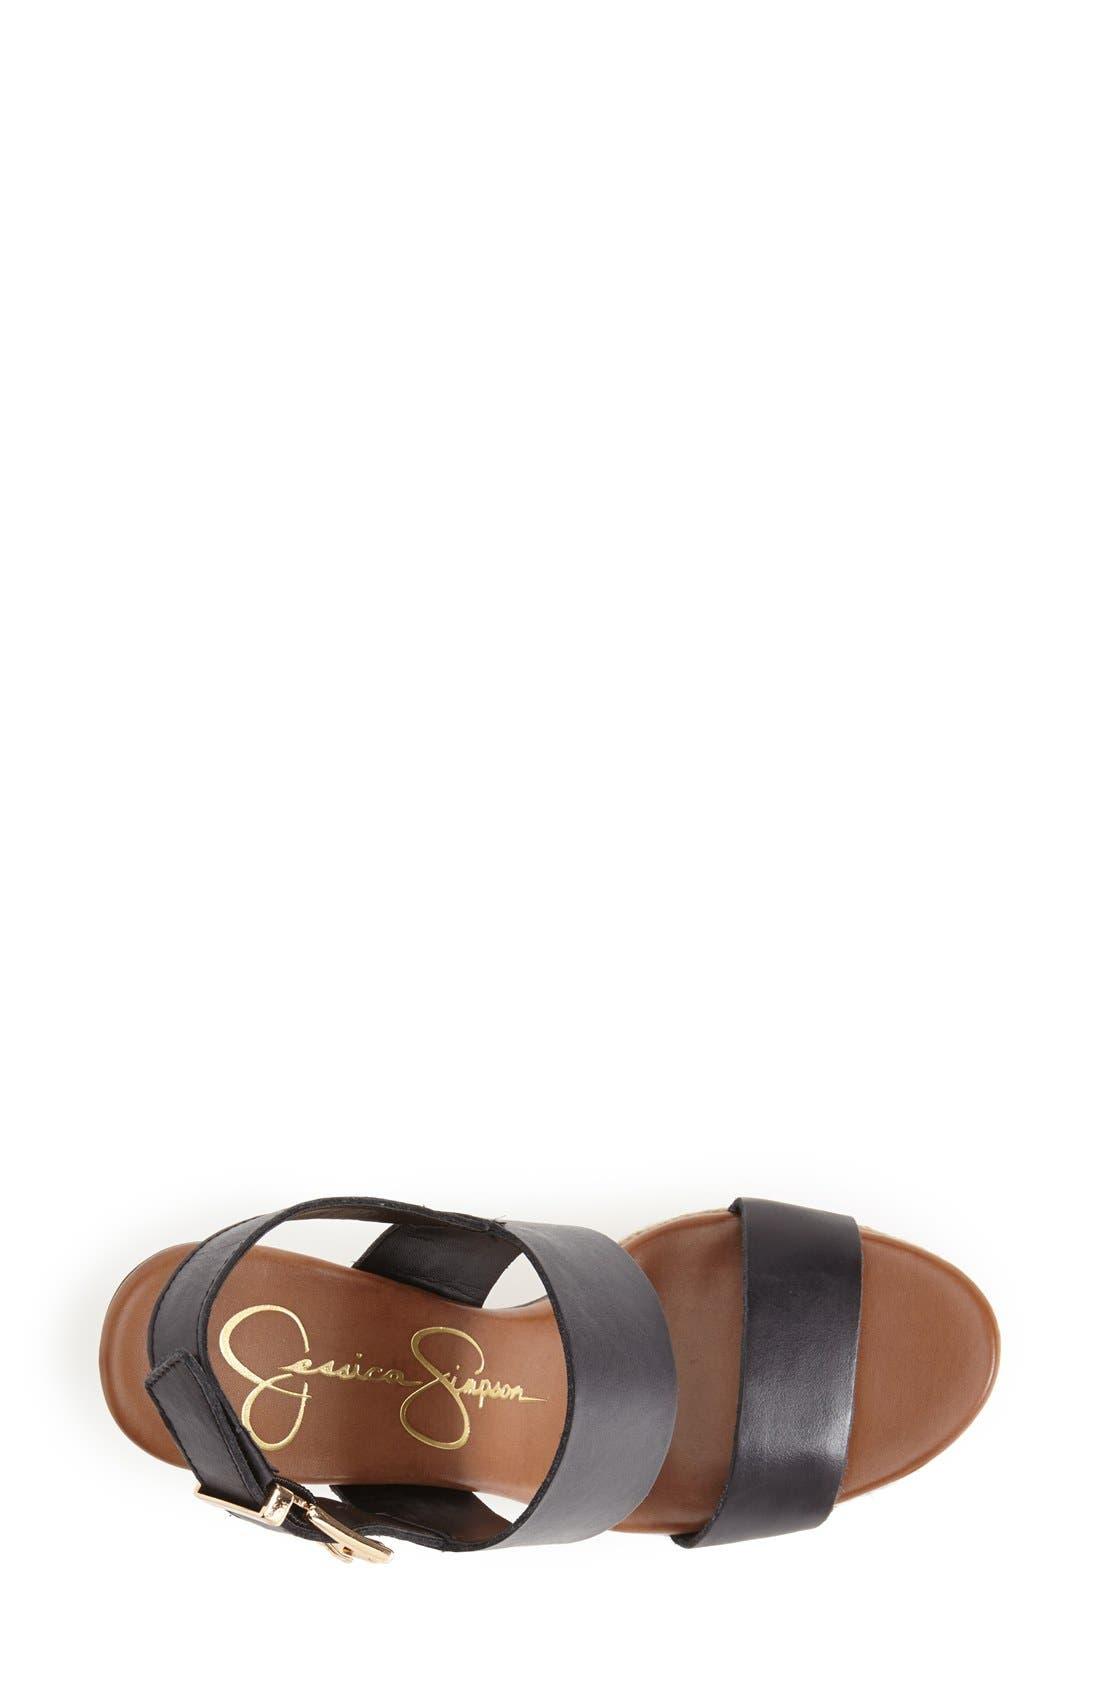 'Allyn' Wedge Platform Leather Sandal,                             Alternate thumbnail 3, color,                             001